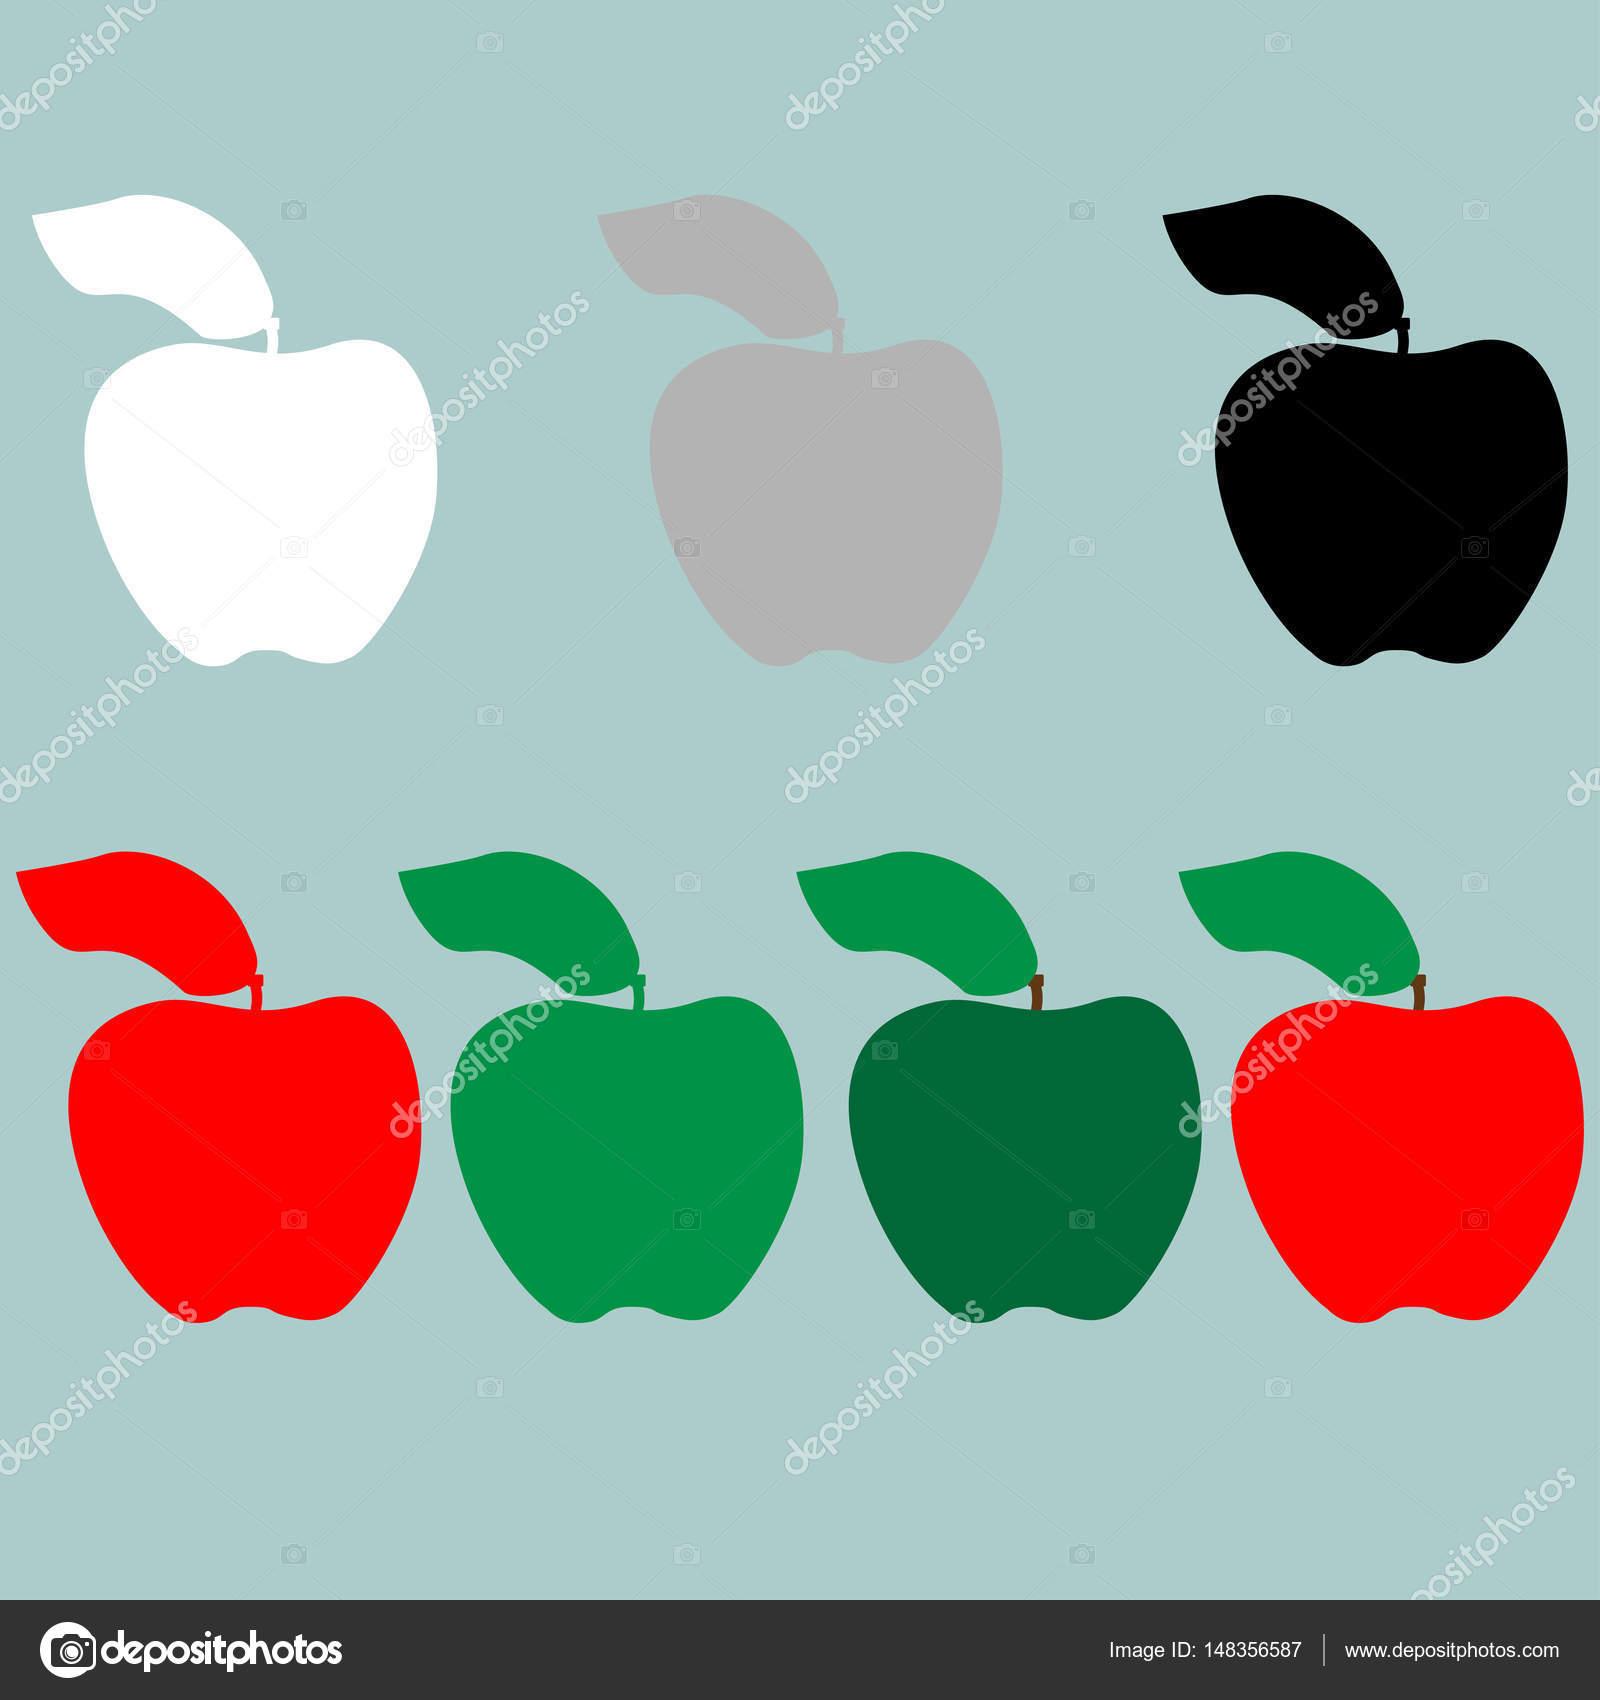 Cone verde vermelho preto cinza branco apple vetor de stock cone verde vermelho preto cinza branco apple vetor de stock altavistaventures Choice Image